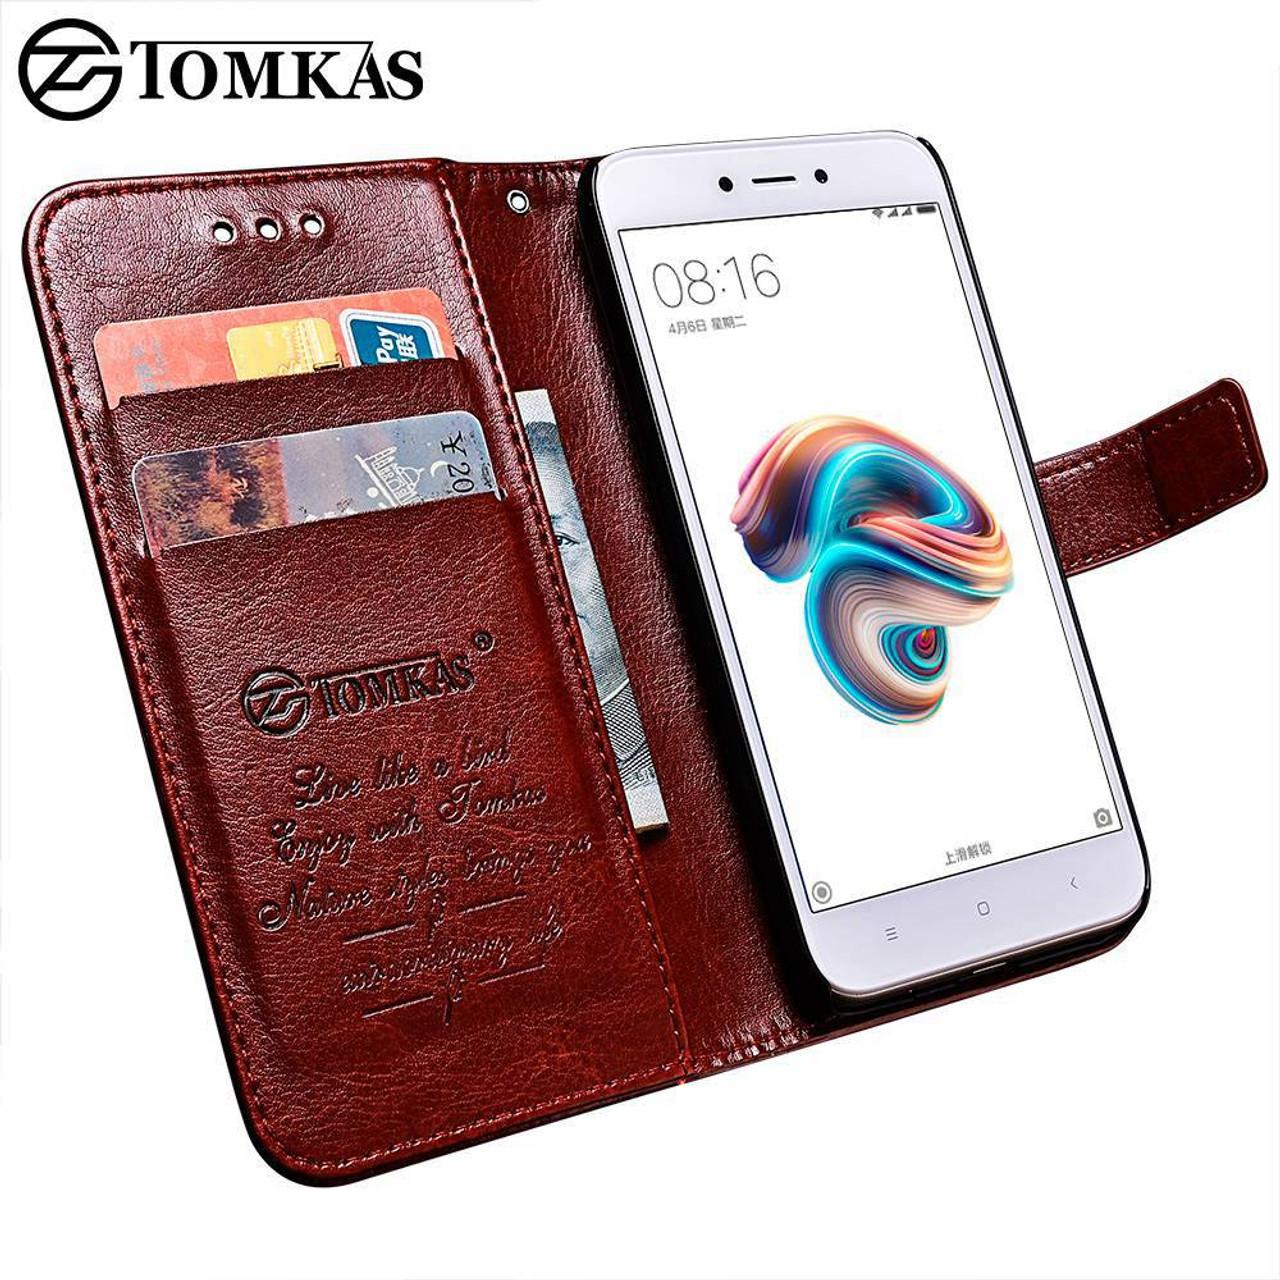 sale retailer 3e00c bd90f Tomkas Wallet Case Xiaomi Redmi 5A Case Leather PU Luxury Flip Phone Bag  Cover For Xiaomi Redmi 5A Case Coque Card Slot Holder